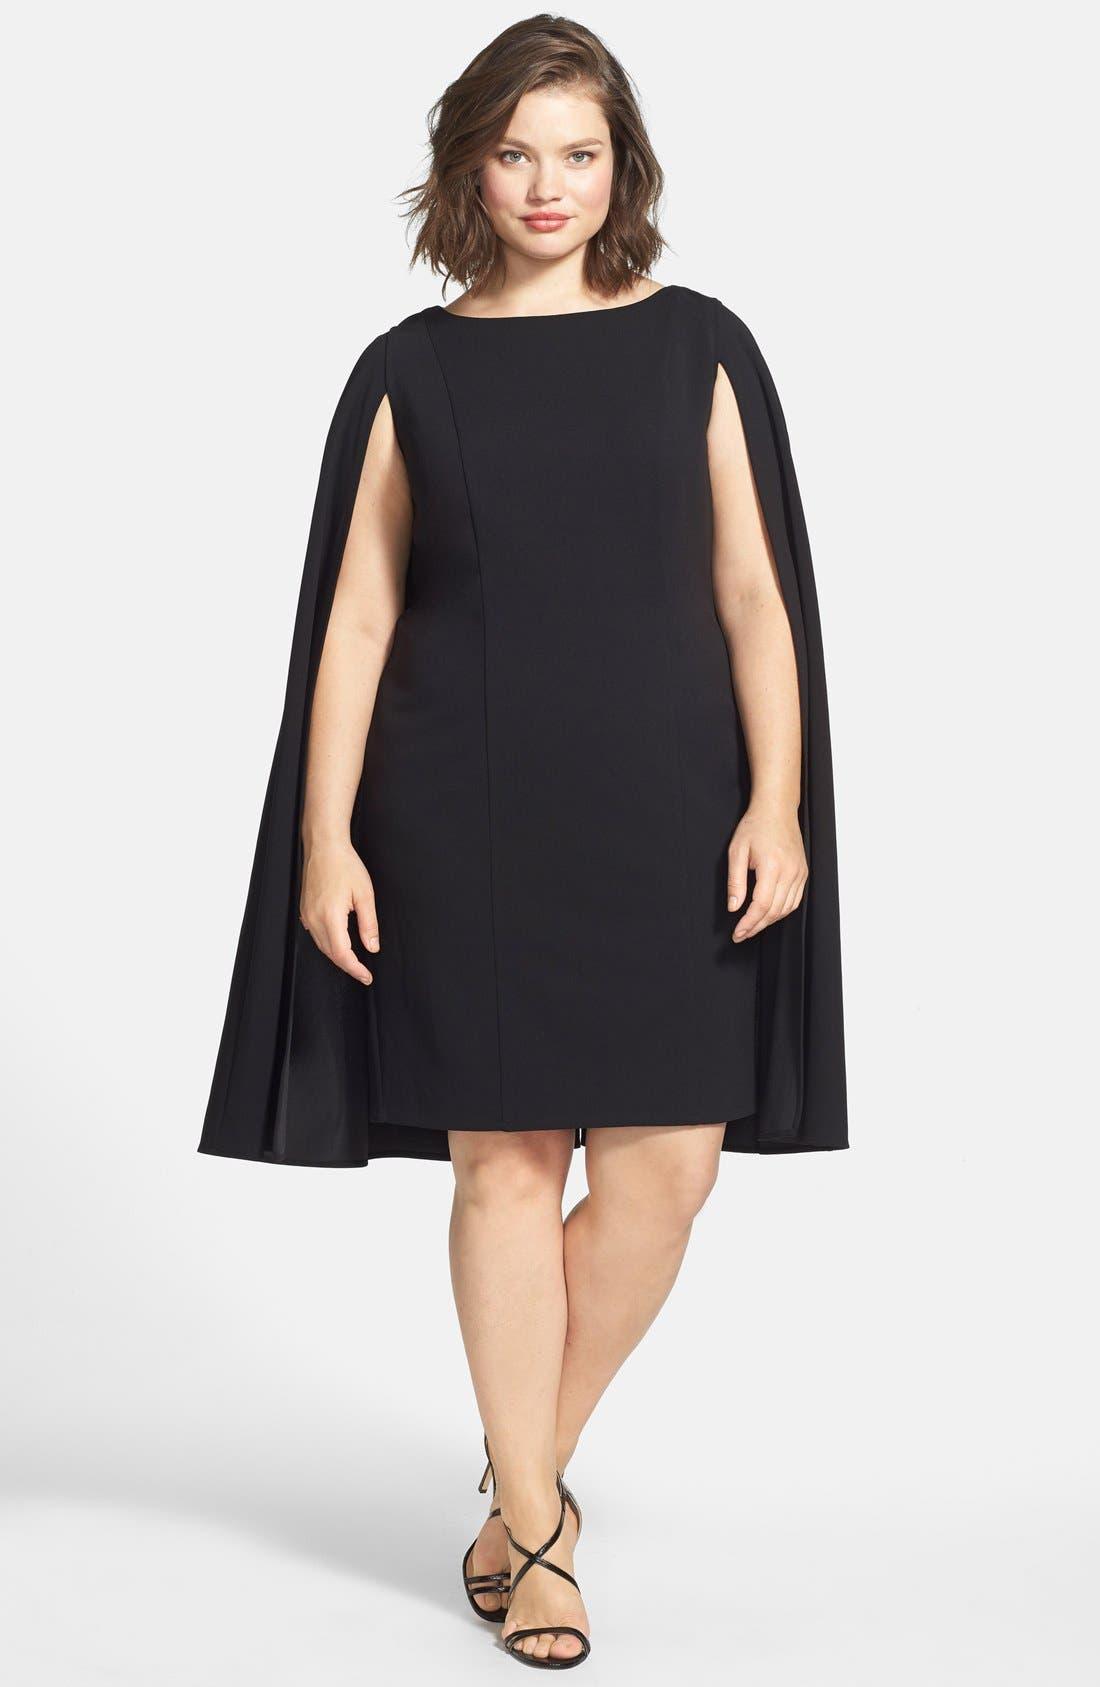 Cape Sheath Dress,                             Alternate thumbnail 10, color,                             001